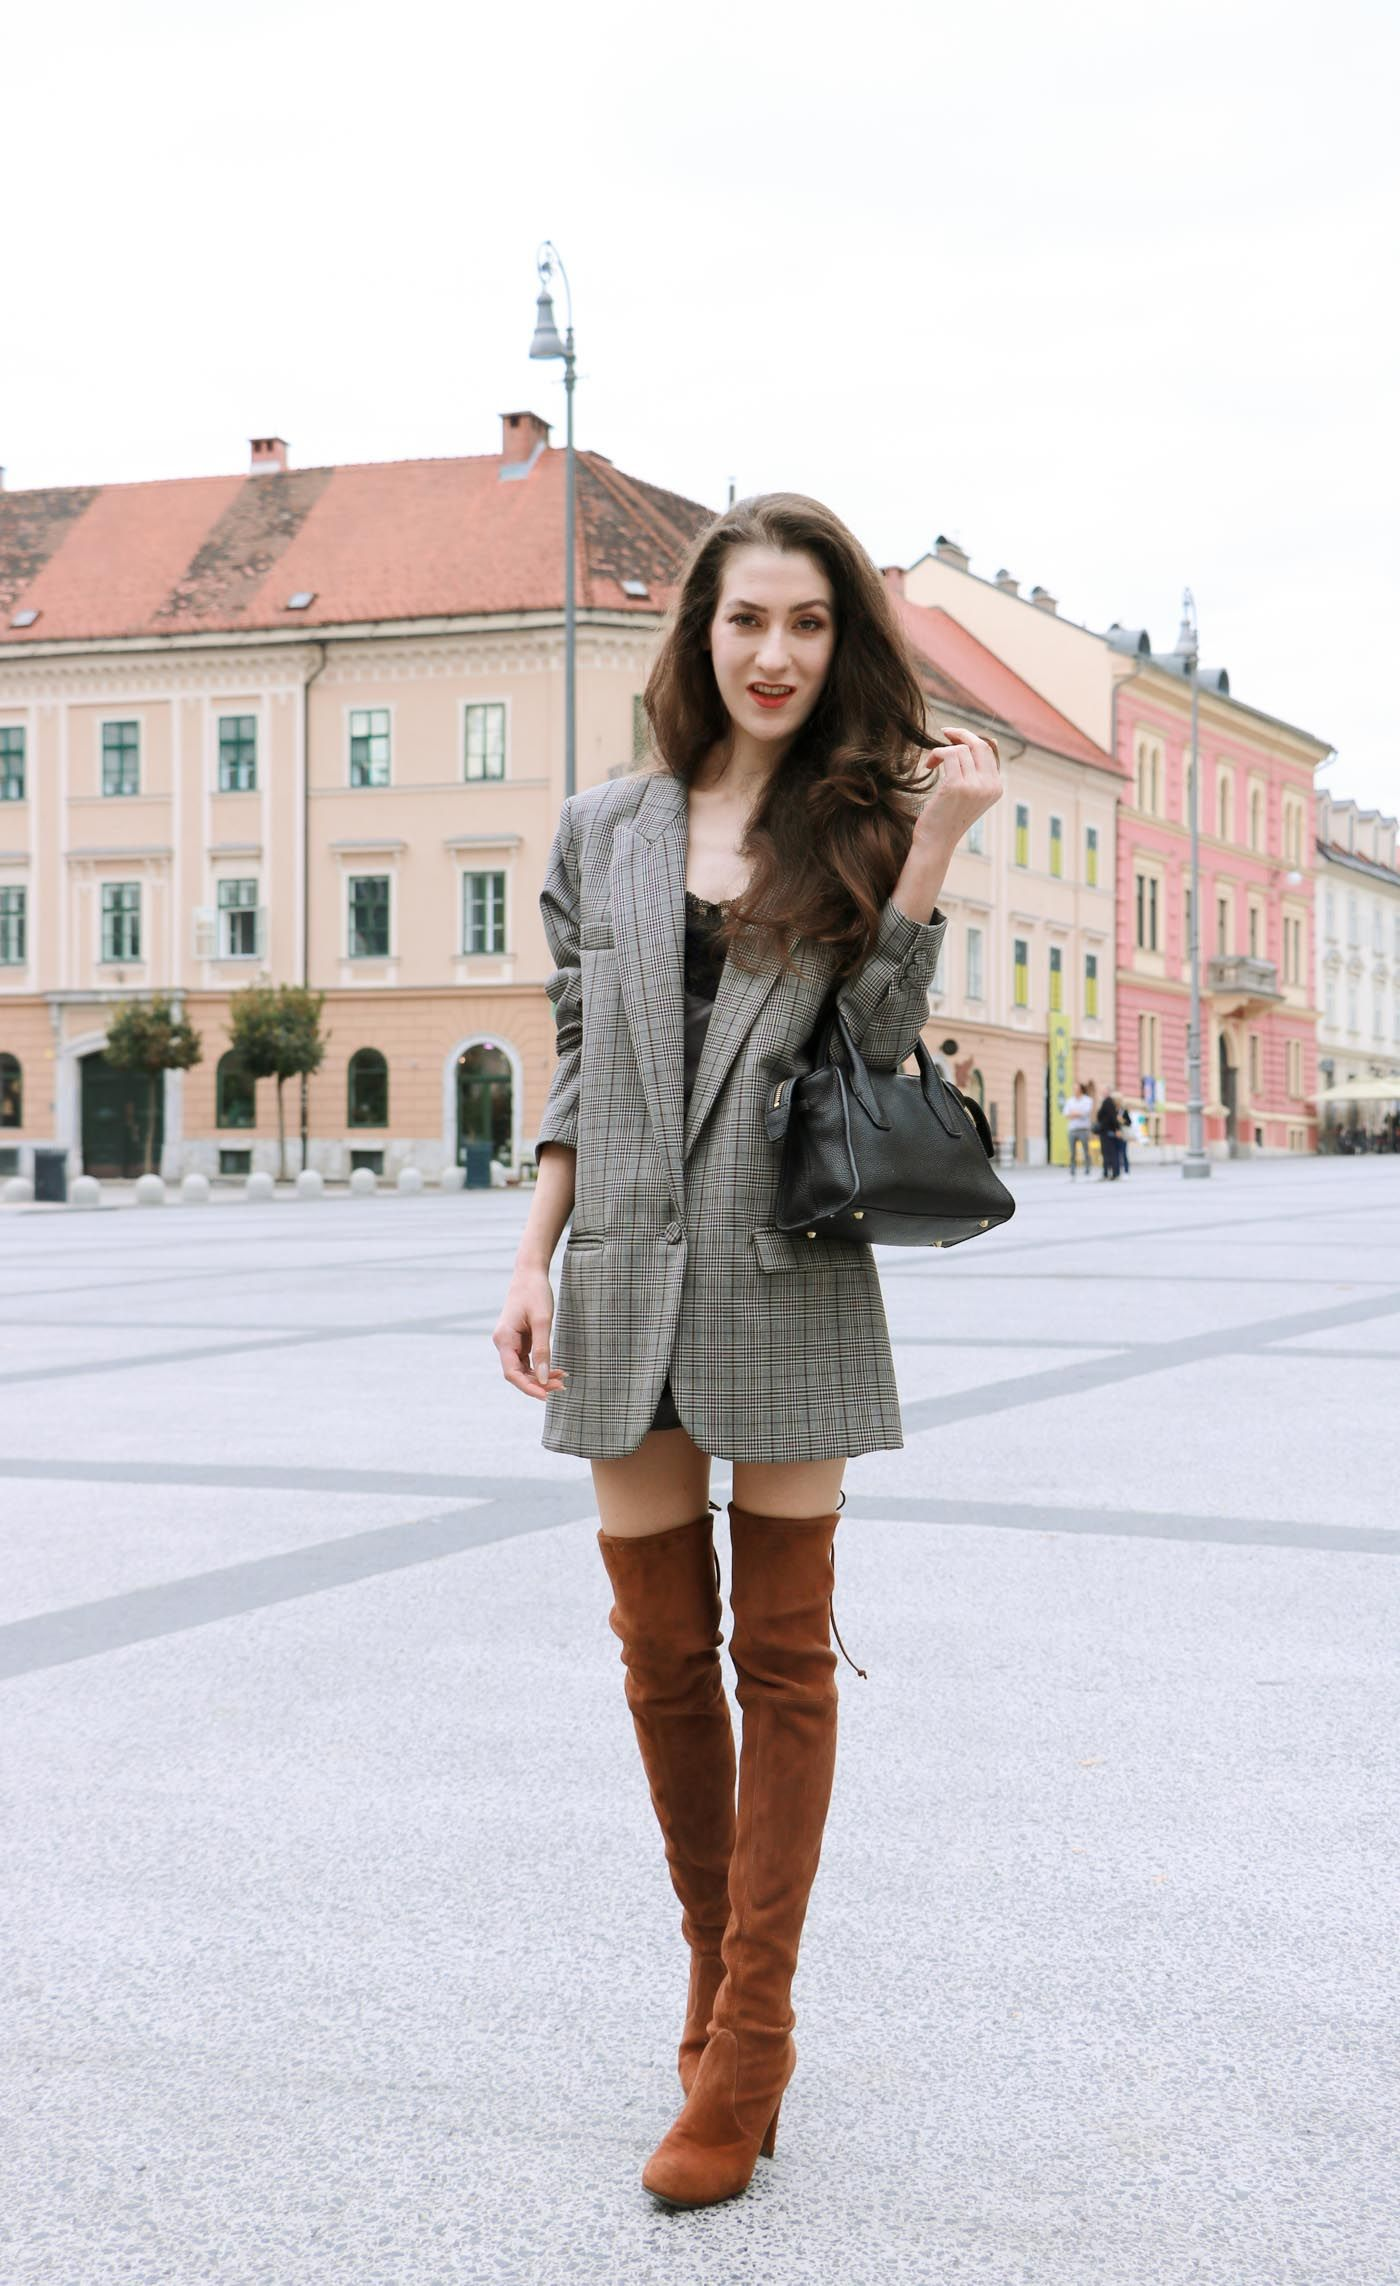 e4c8847fa93 Fashion Blogger Veronika Lipar of Brunette from Wall wearing brown Stuart  Weitzman highland boots